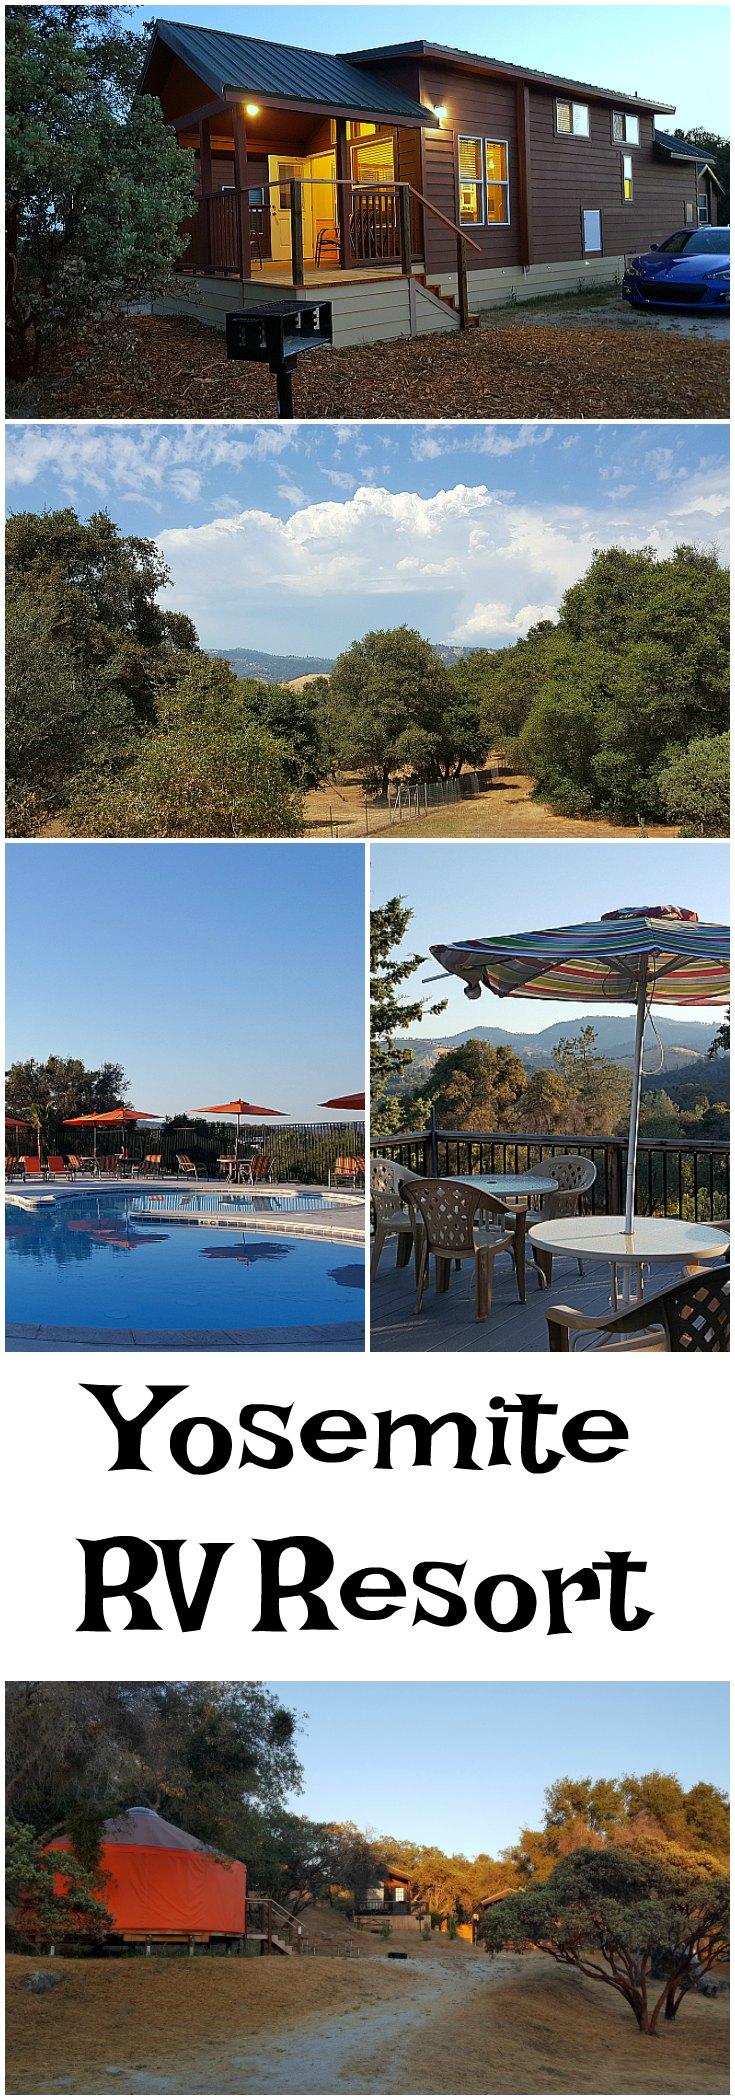 Yosemite RV Resort